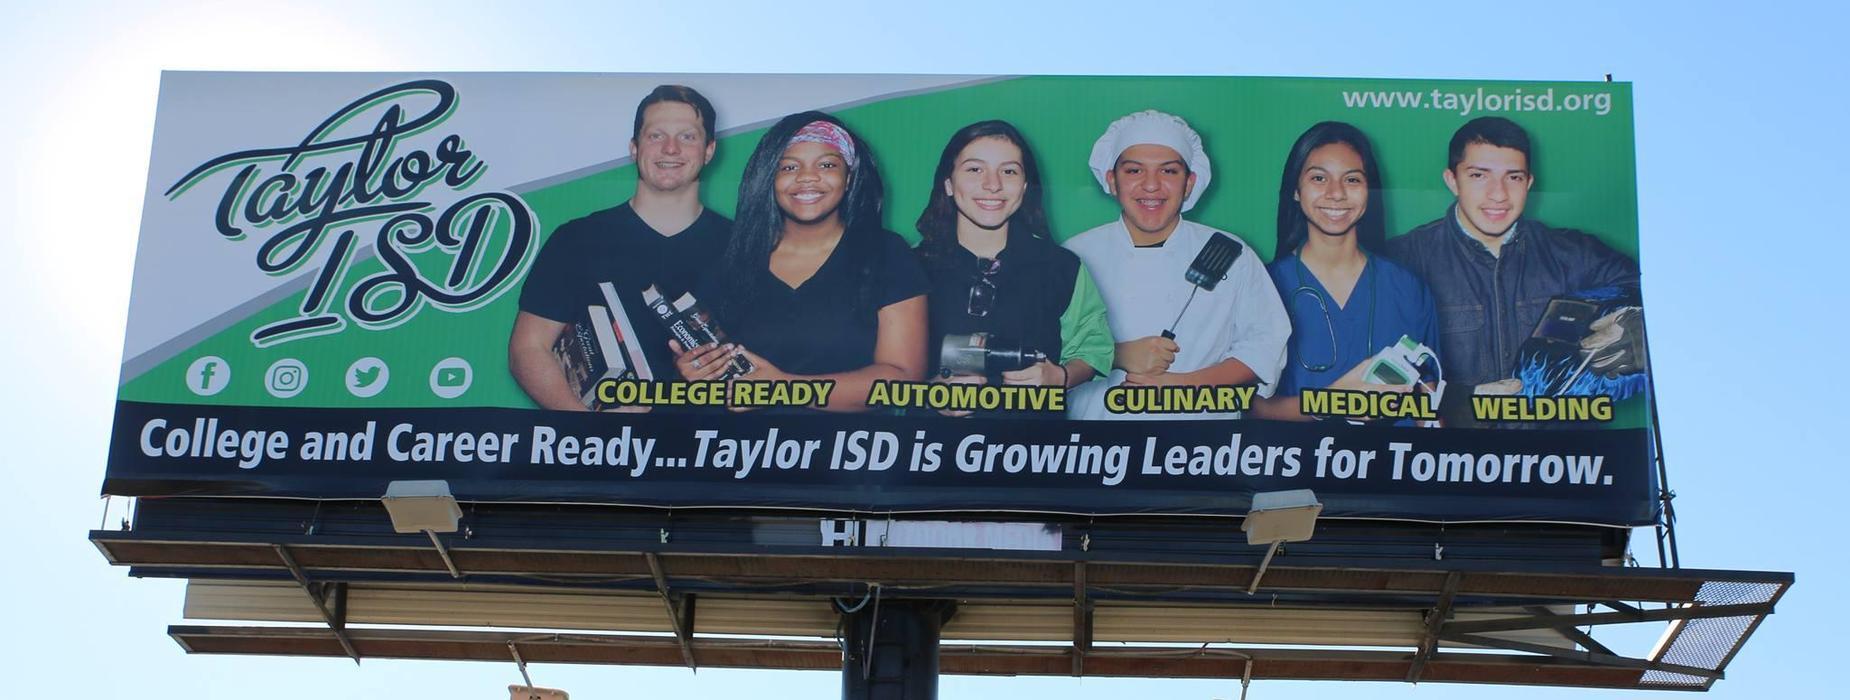 Taylor ISD billboard